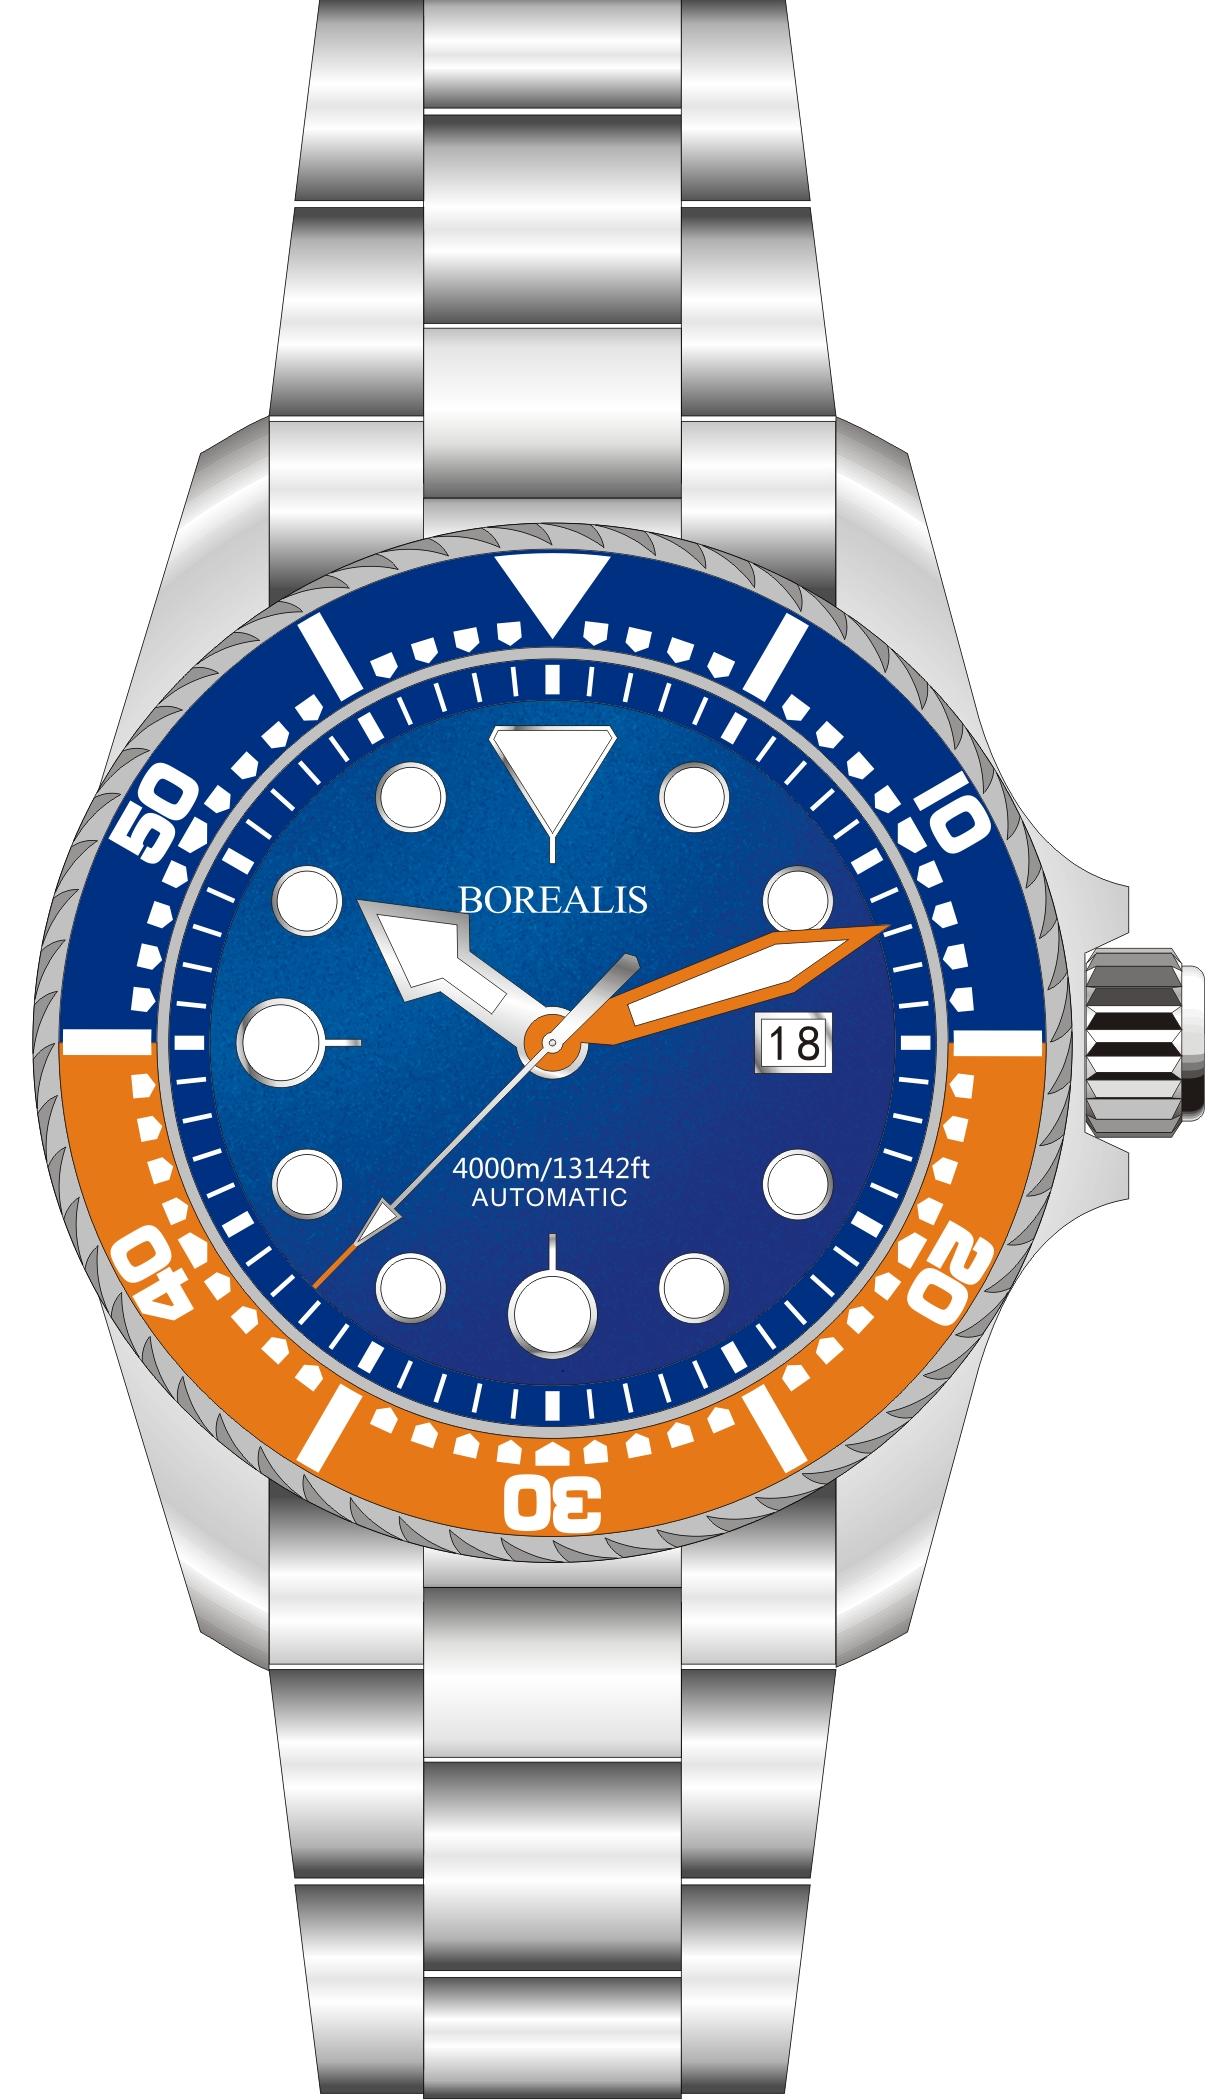 Borealis Seafarer II Stainless Steel Blue Orange BGW9 Sapphire Turbine Style Grip Bezel 4000m Miyota 9015 Automatic Diver Watch BSFIIBLUEORANGEBGW9